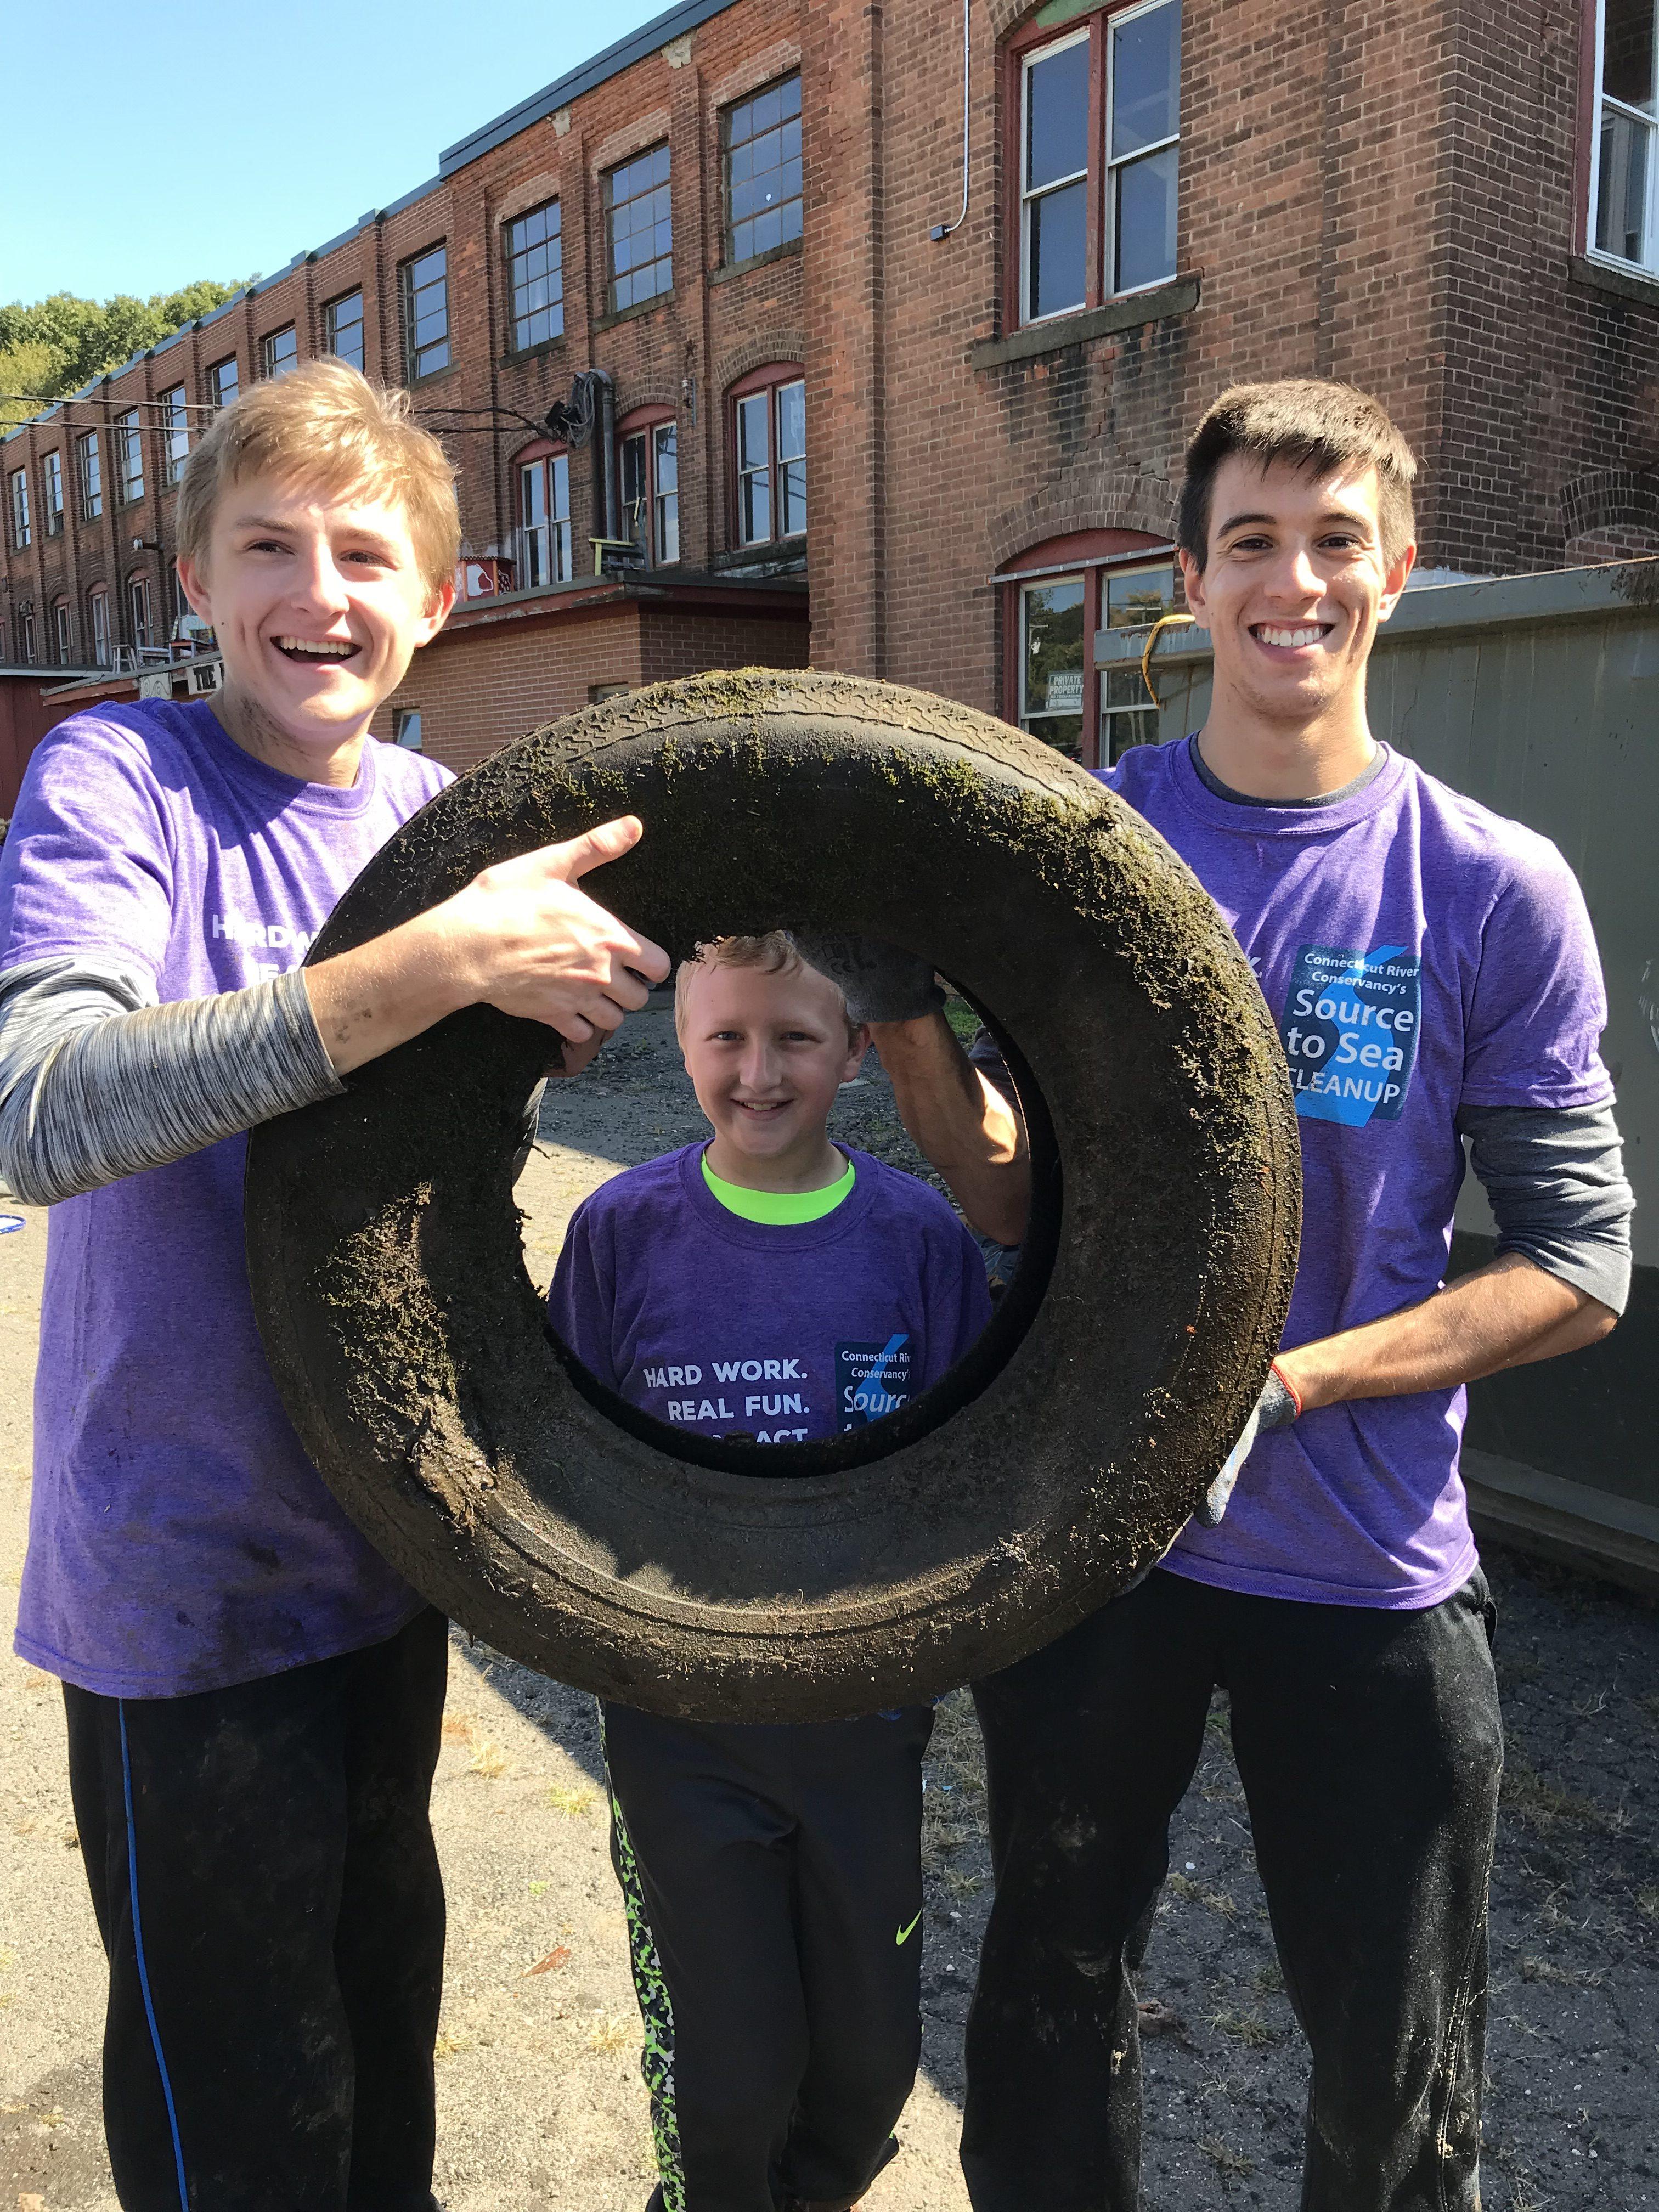 one last tire